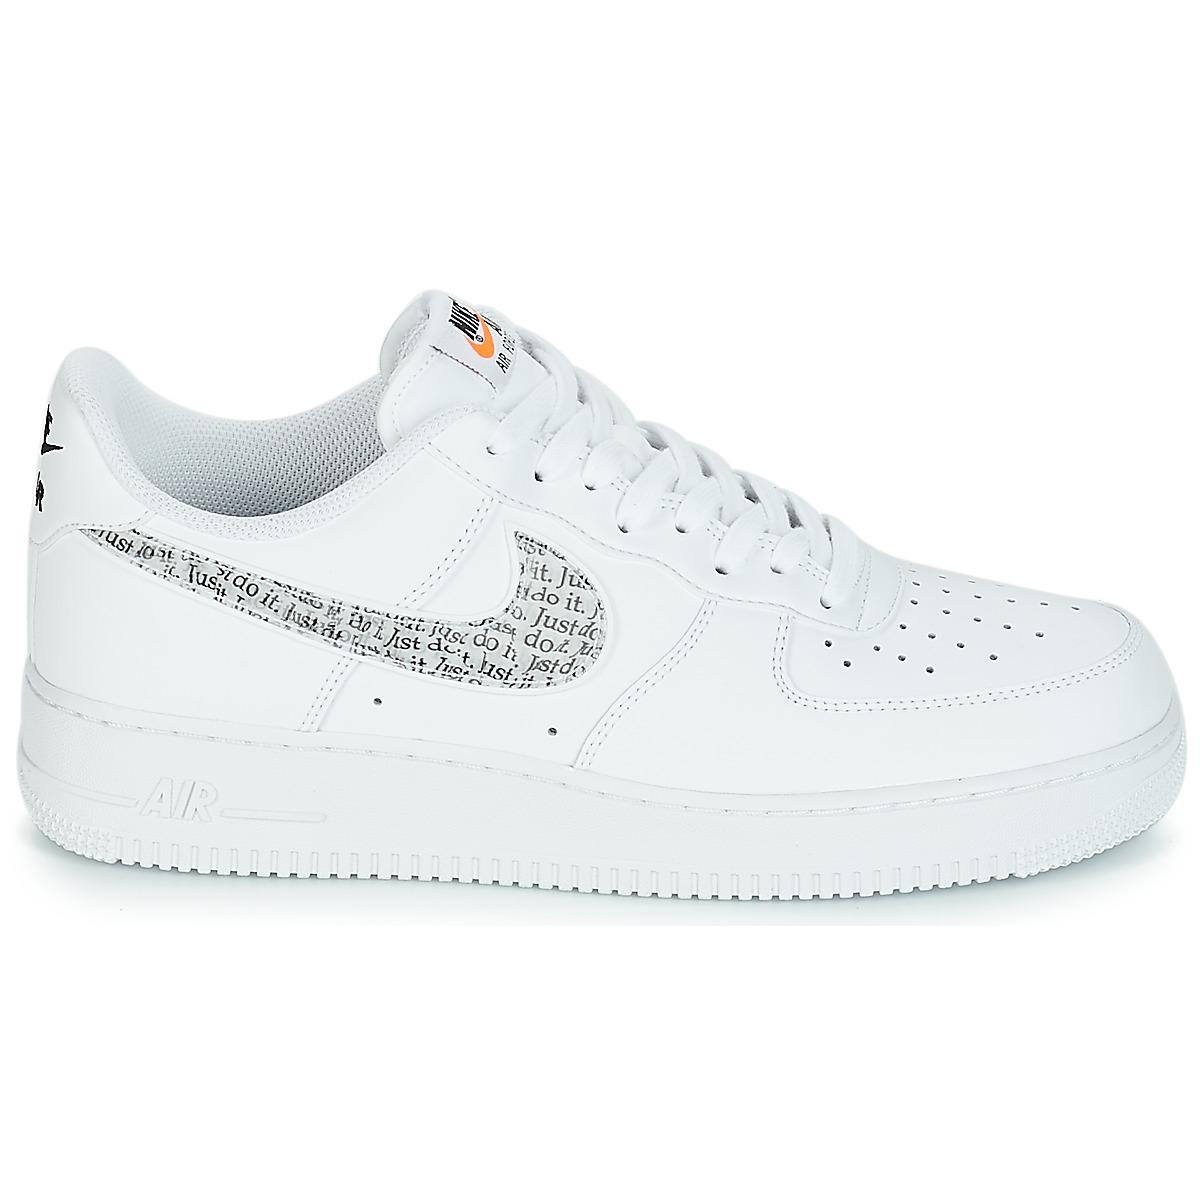 buy online baafa 0ba8c Nike - White AIR FORCE 1  07 LV8 JUST DO IT hommes Chaussures en blanc.  Afficher en plein écran